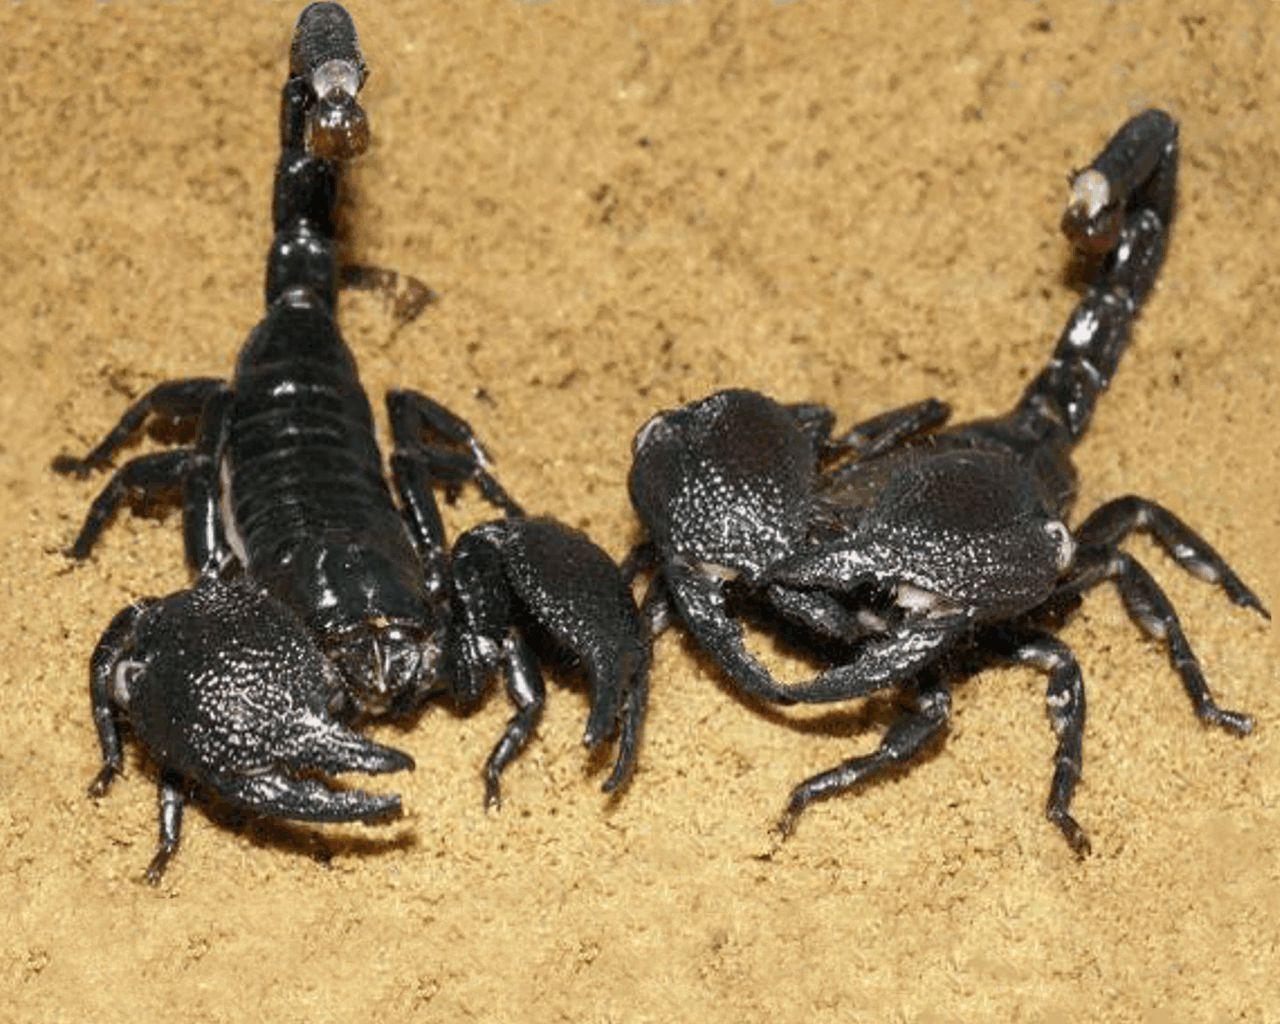 Download free Pair of Biggest Black Scorpion desktop